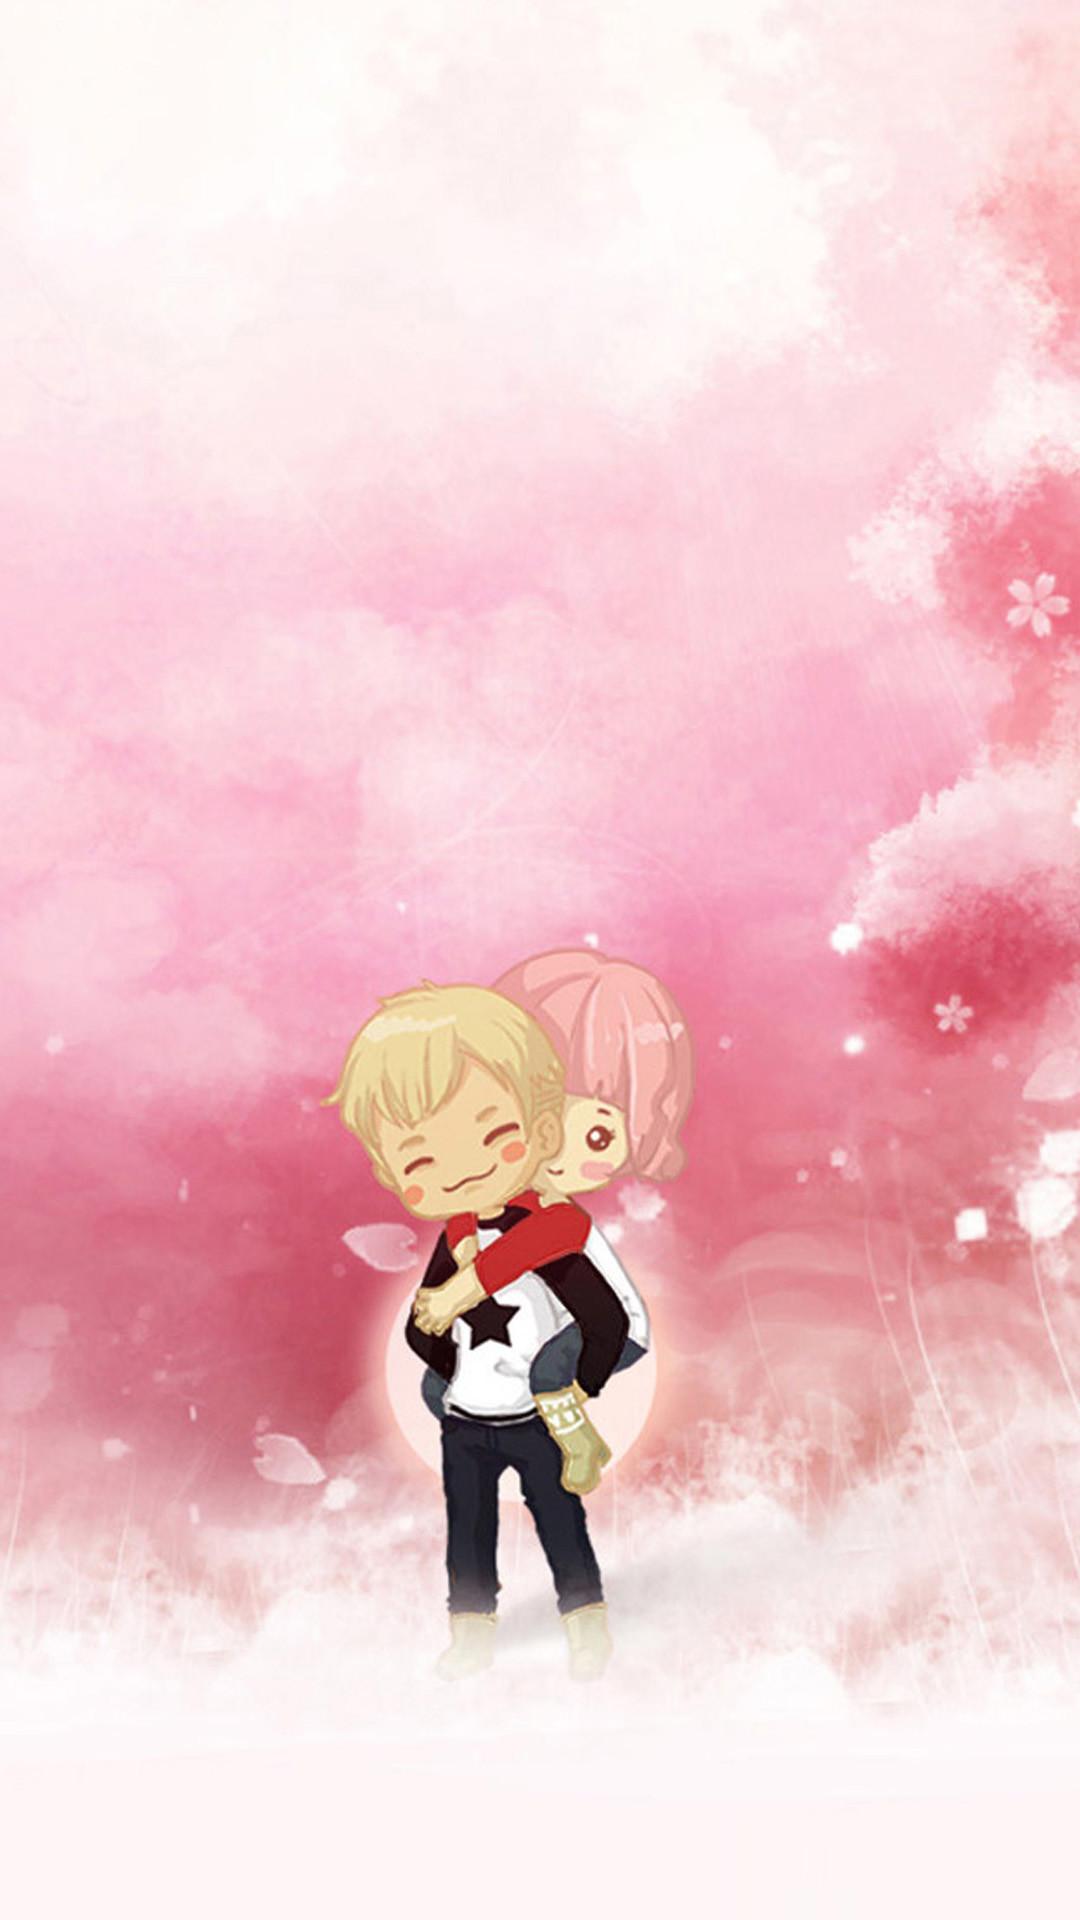 Cute Couple Wallpaper 75 Images